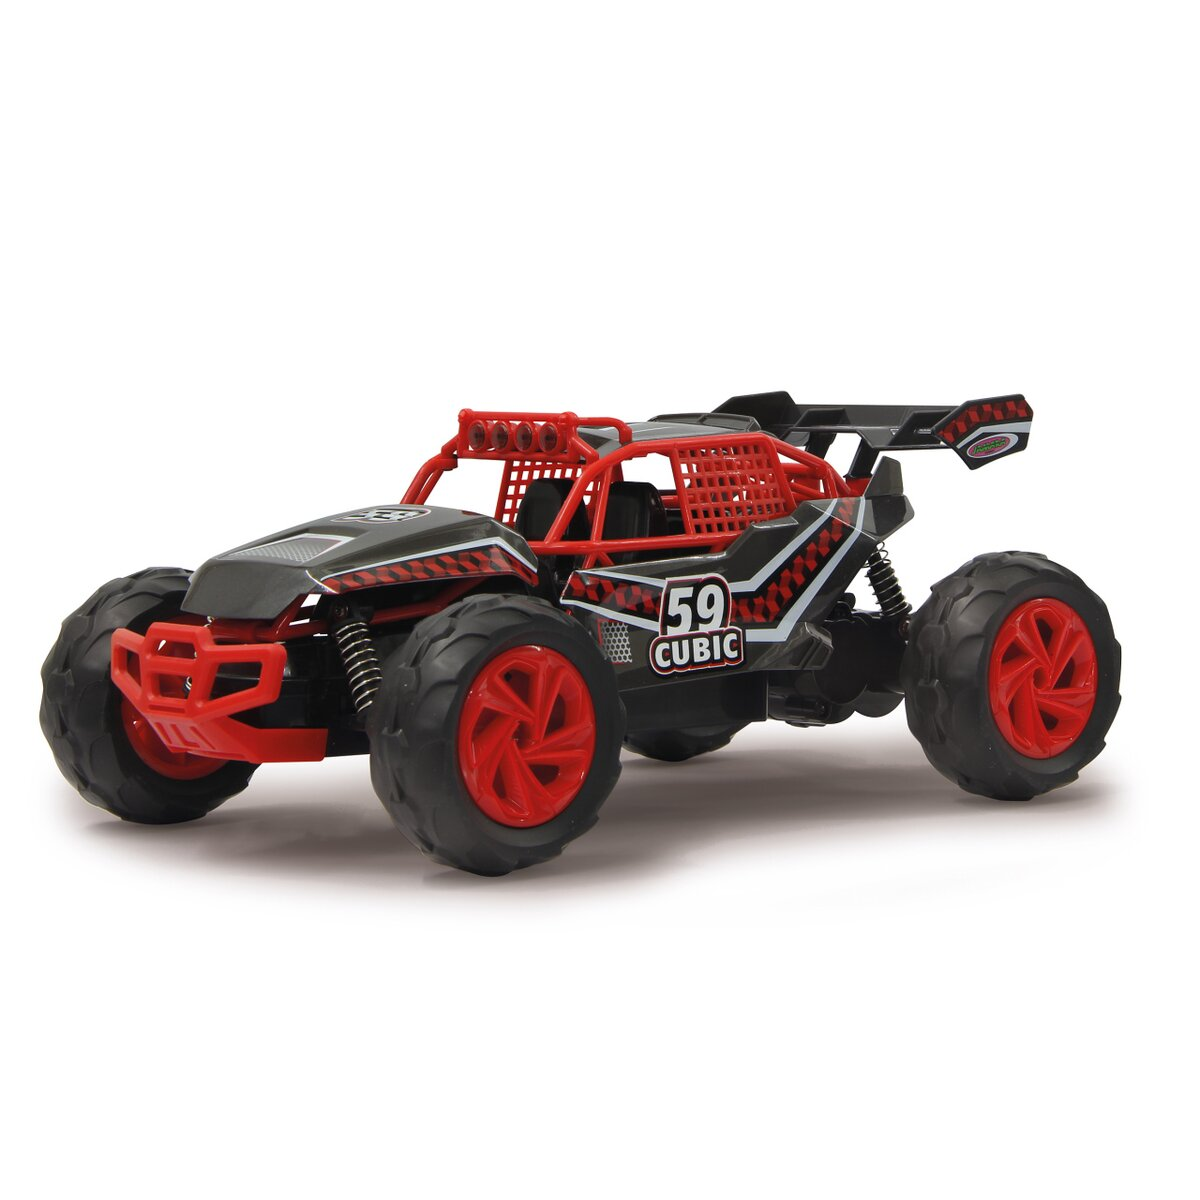 Jamara Cubic Desert Buggy 1:14 2,4GHz